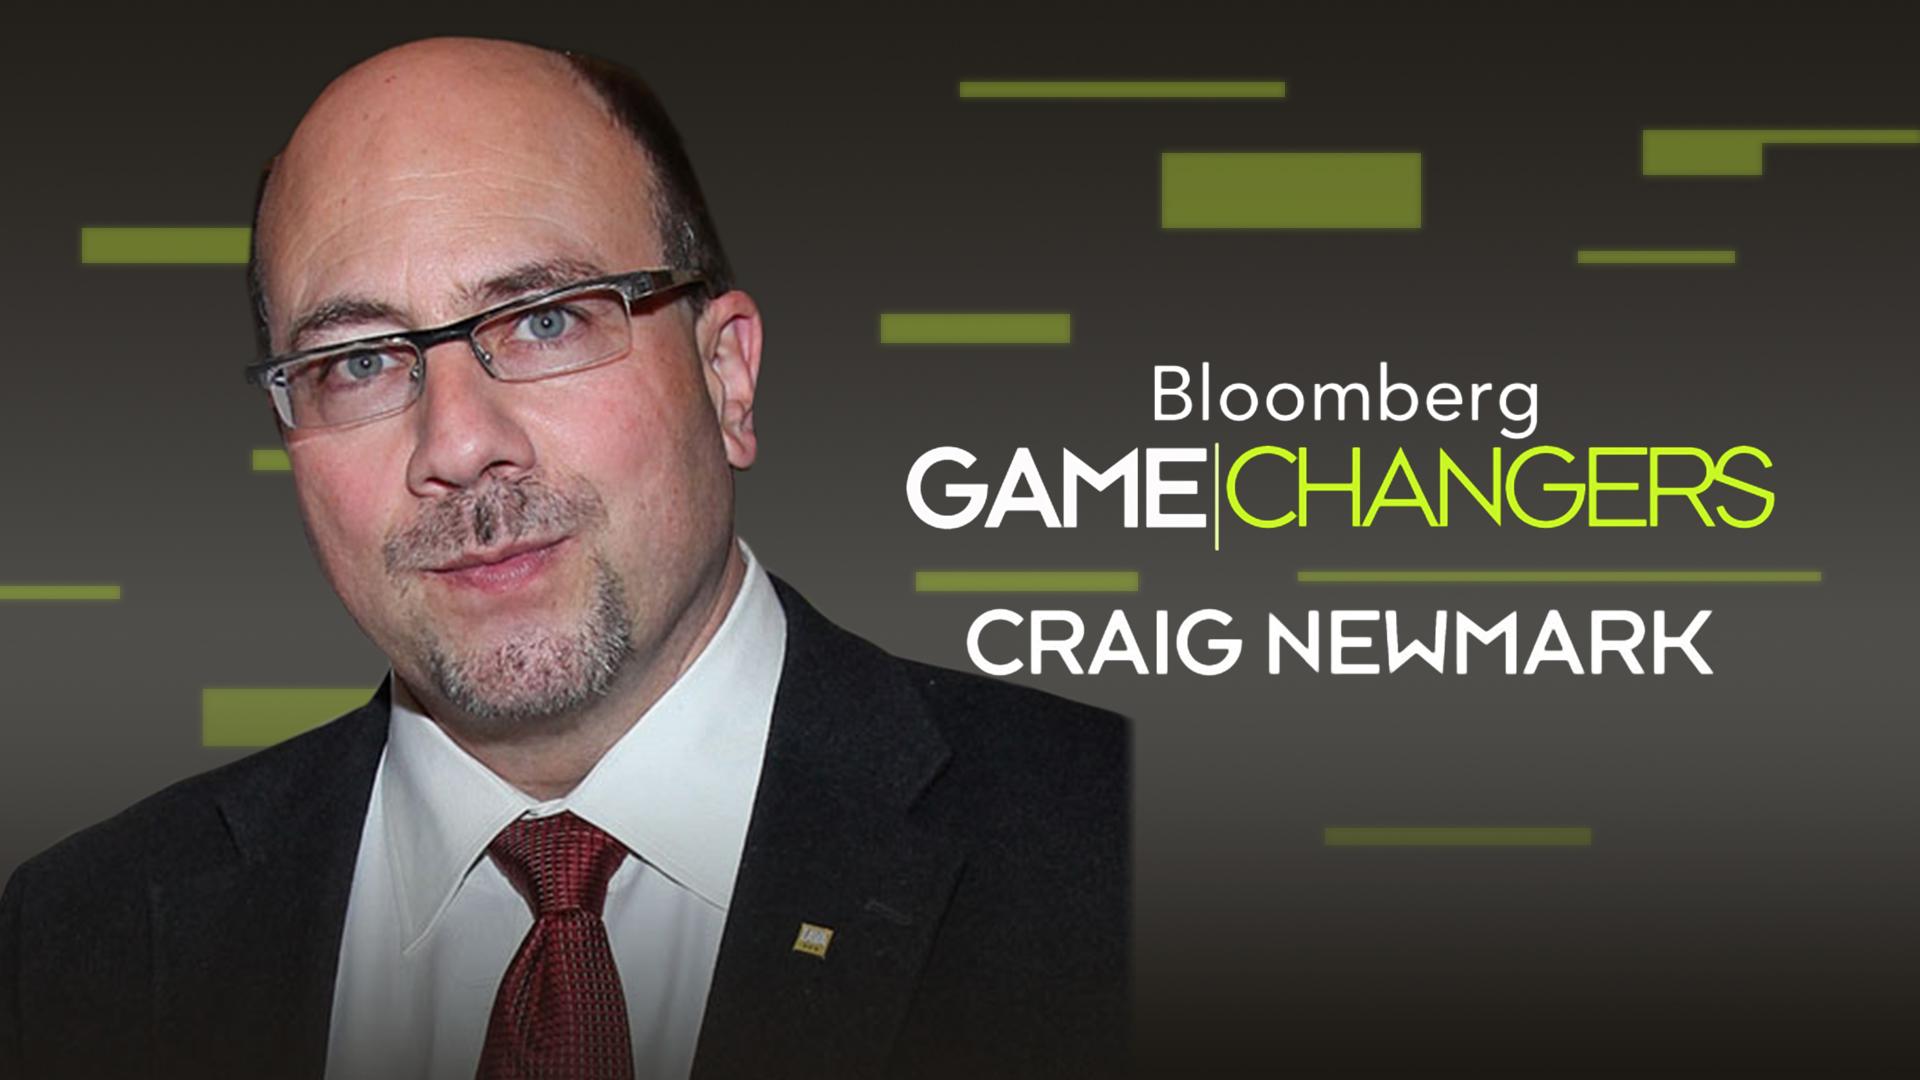 Bloomberg Game Changers: Craig Newmark